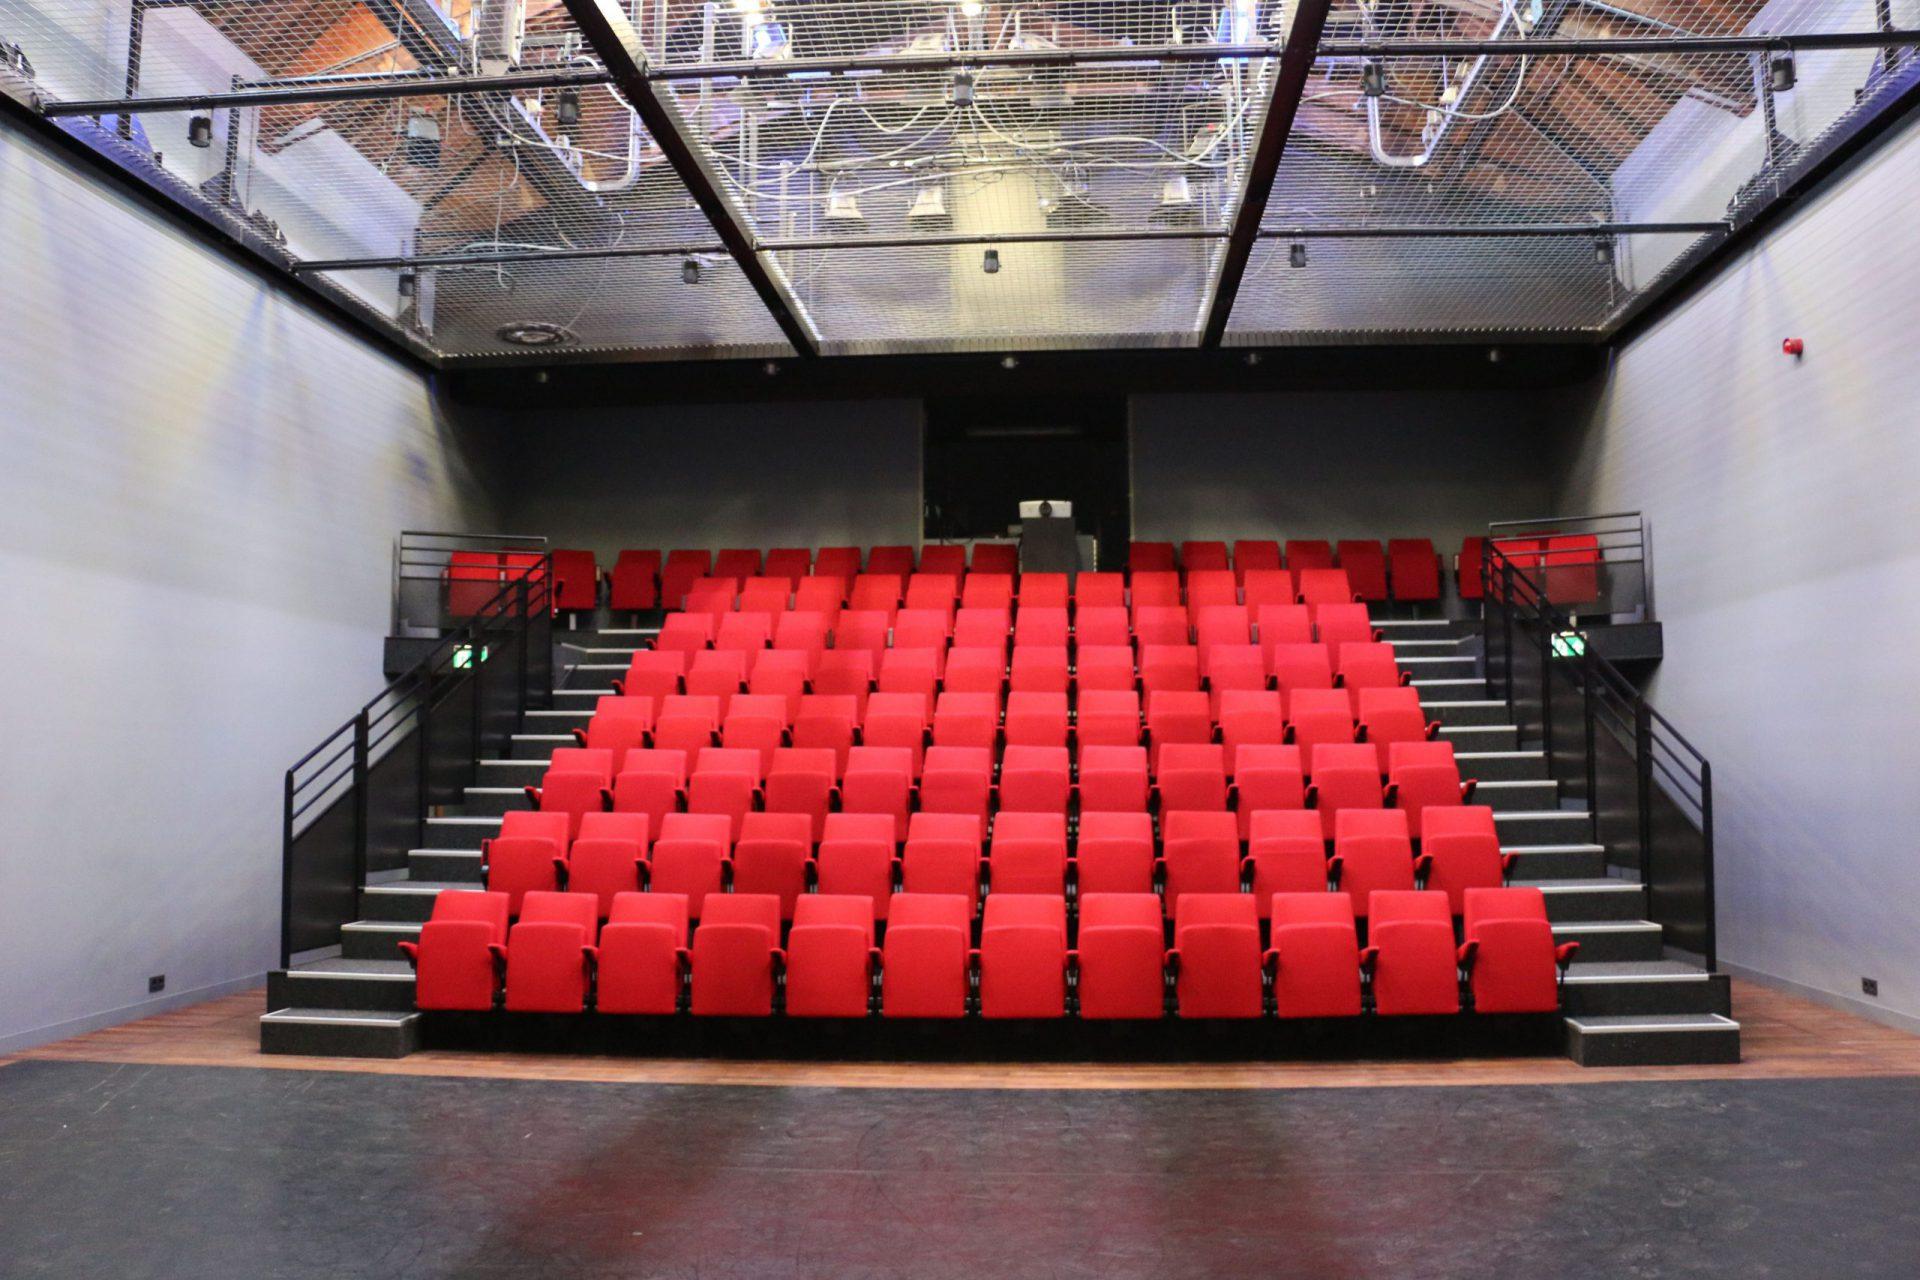 Bovenzaal Theater a/d Rijn - foto Menno van der Meulen